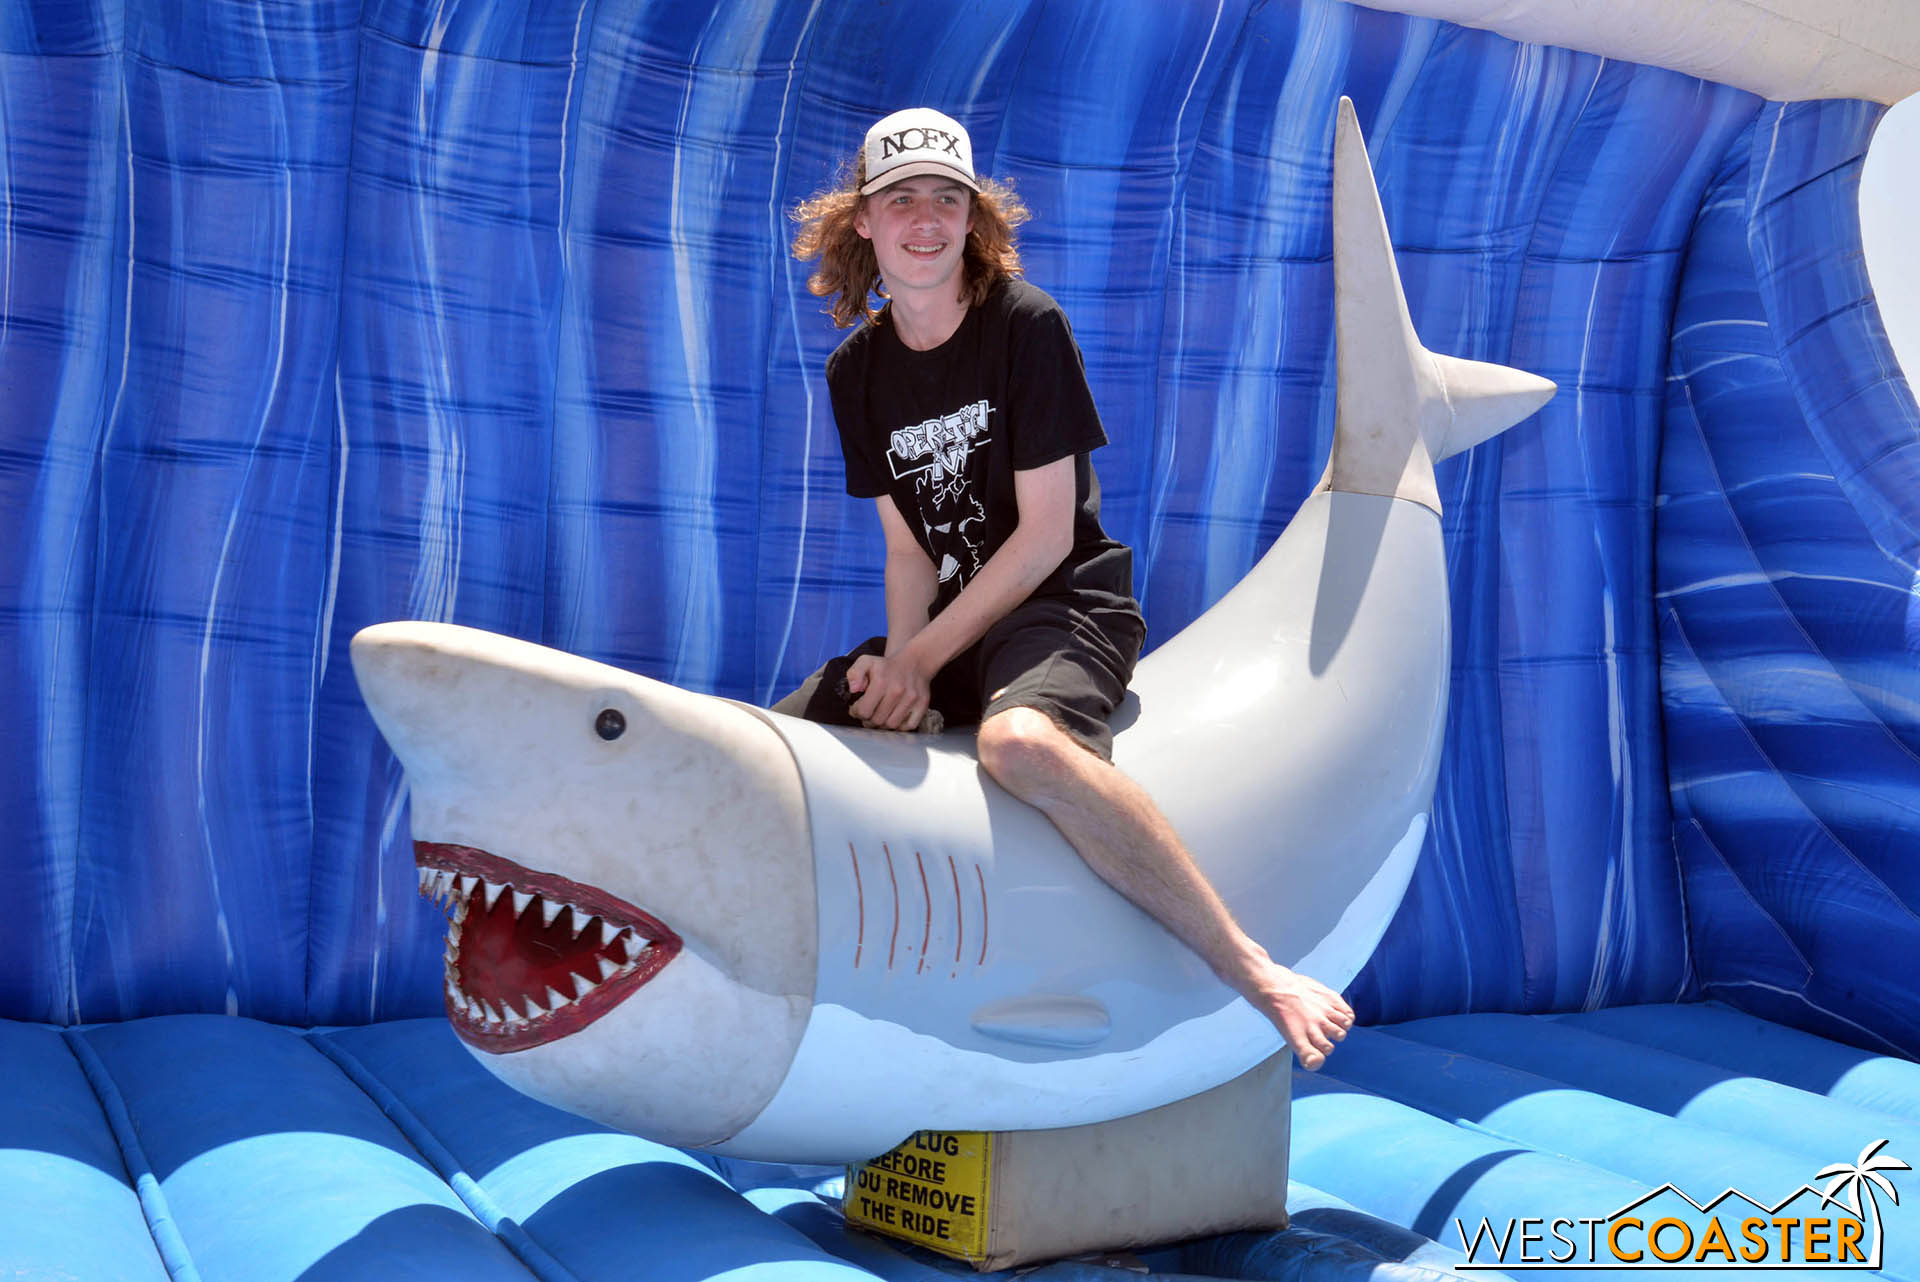 Don't like board games? Go ride a shark.